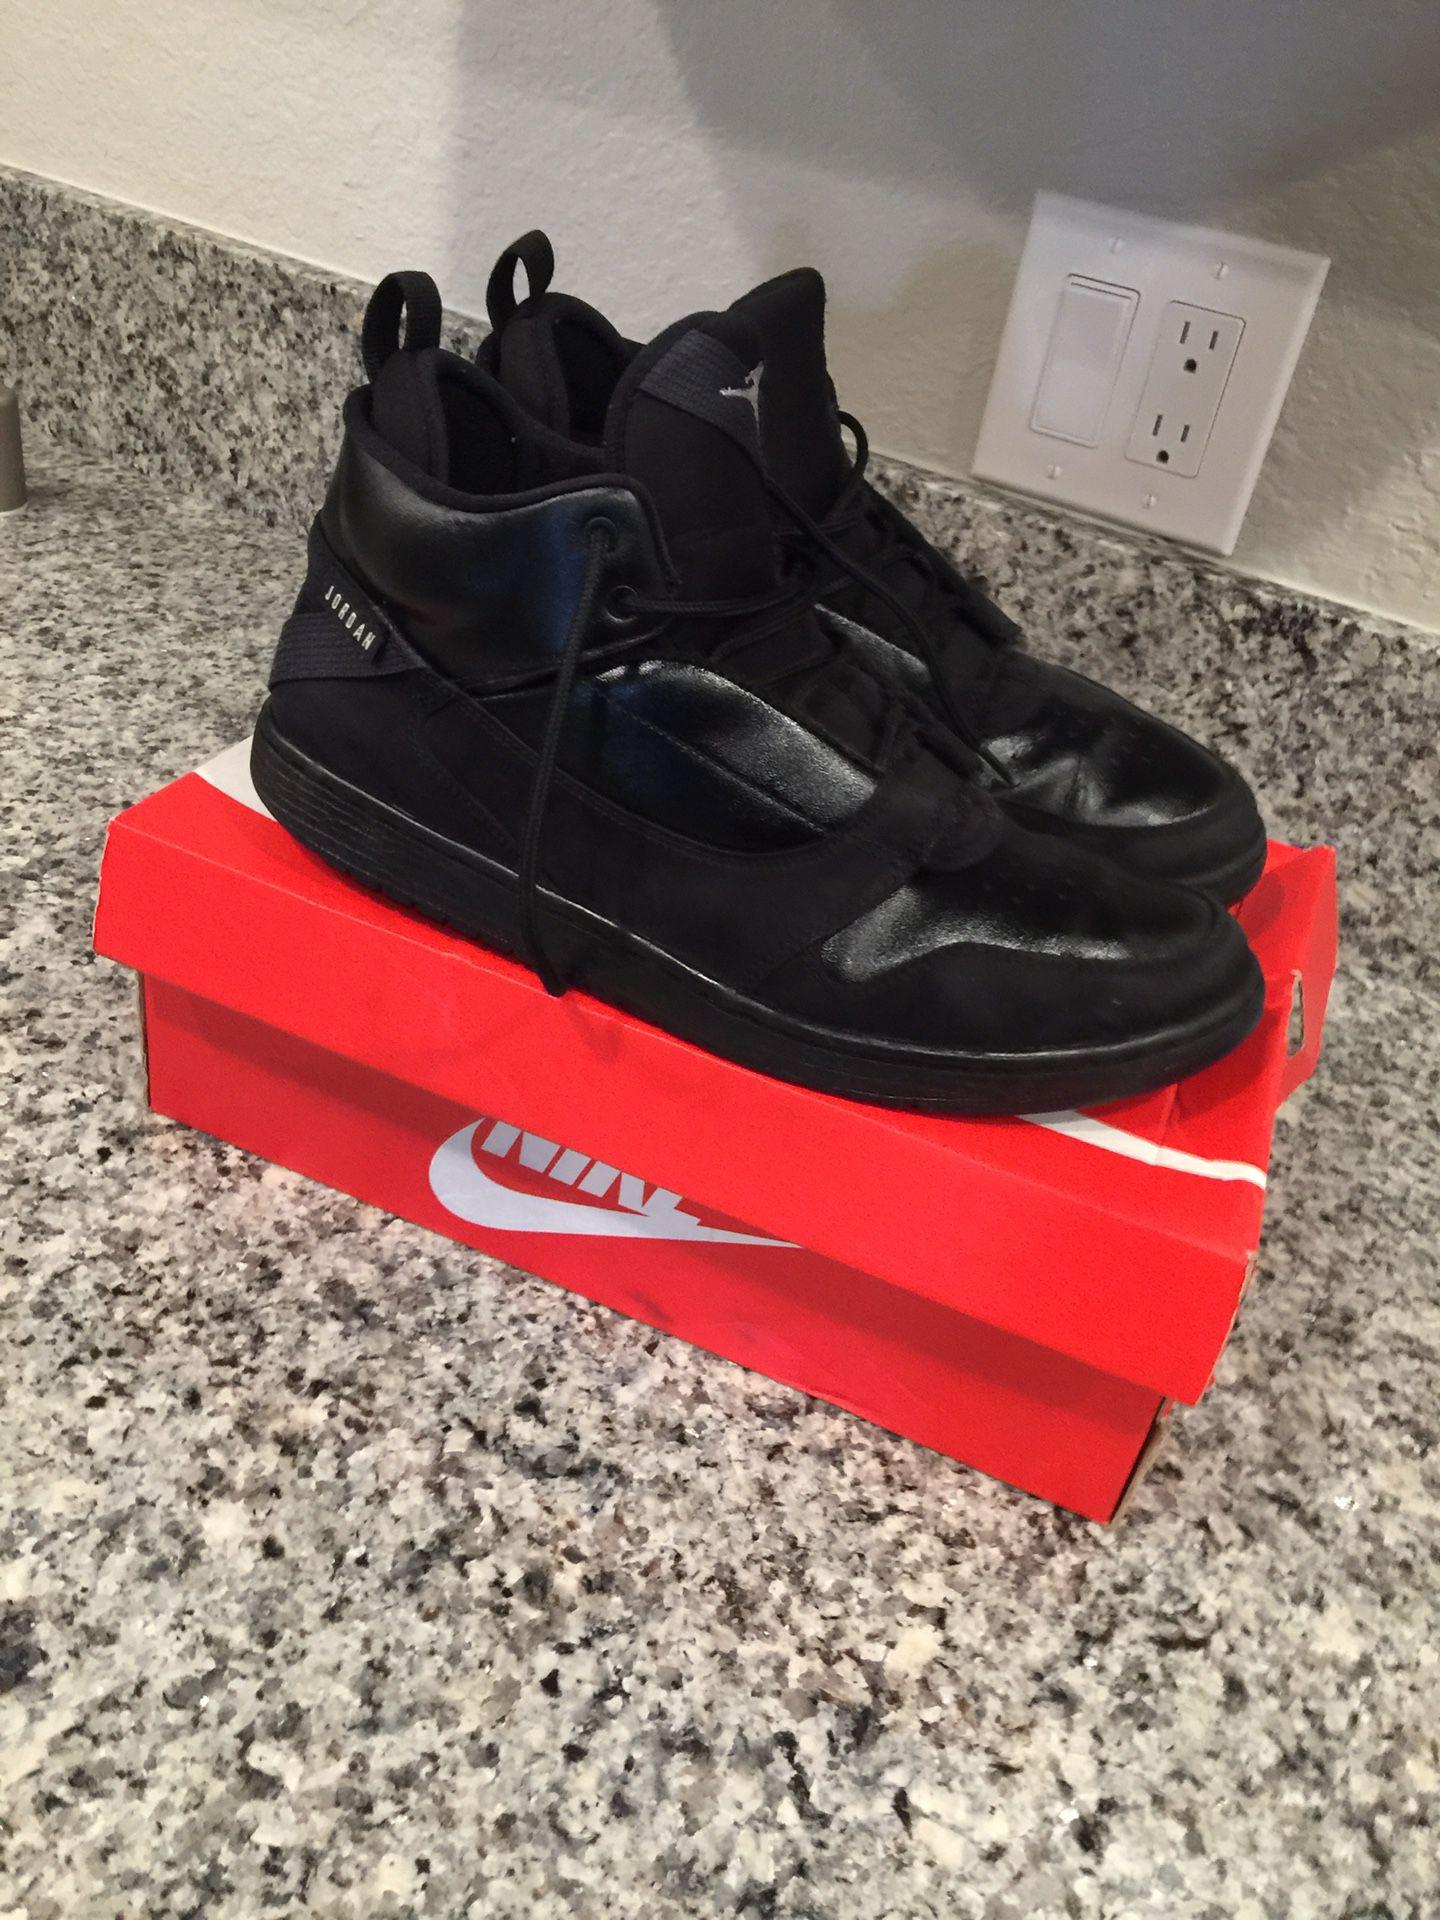 Air Jordan's black size 11